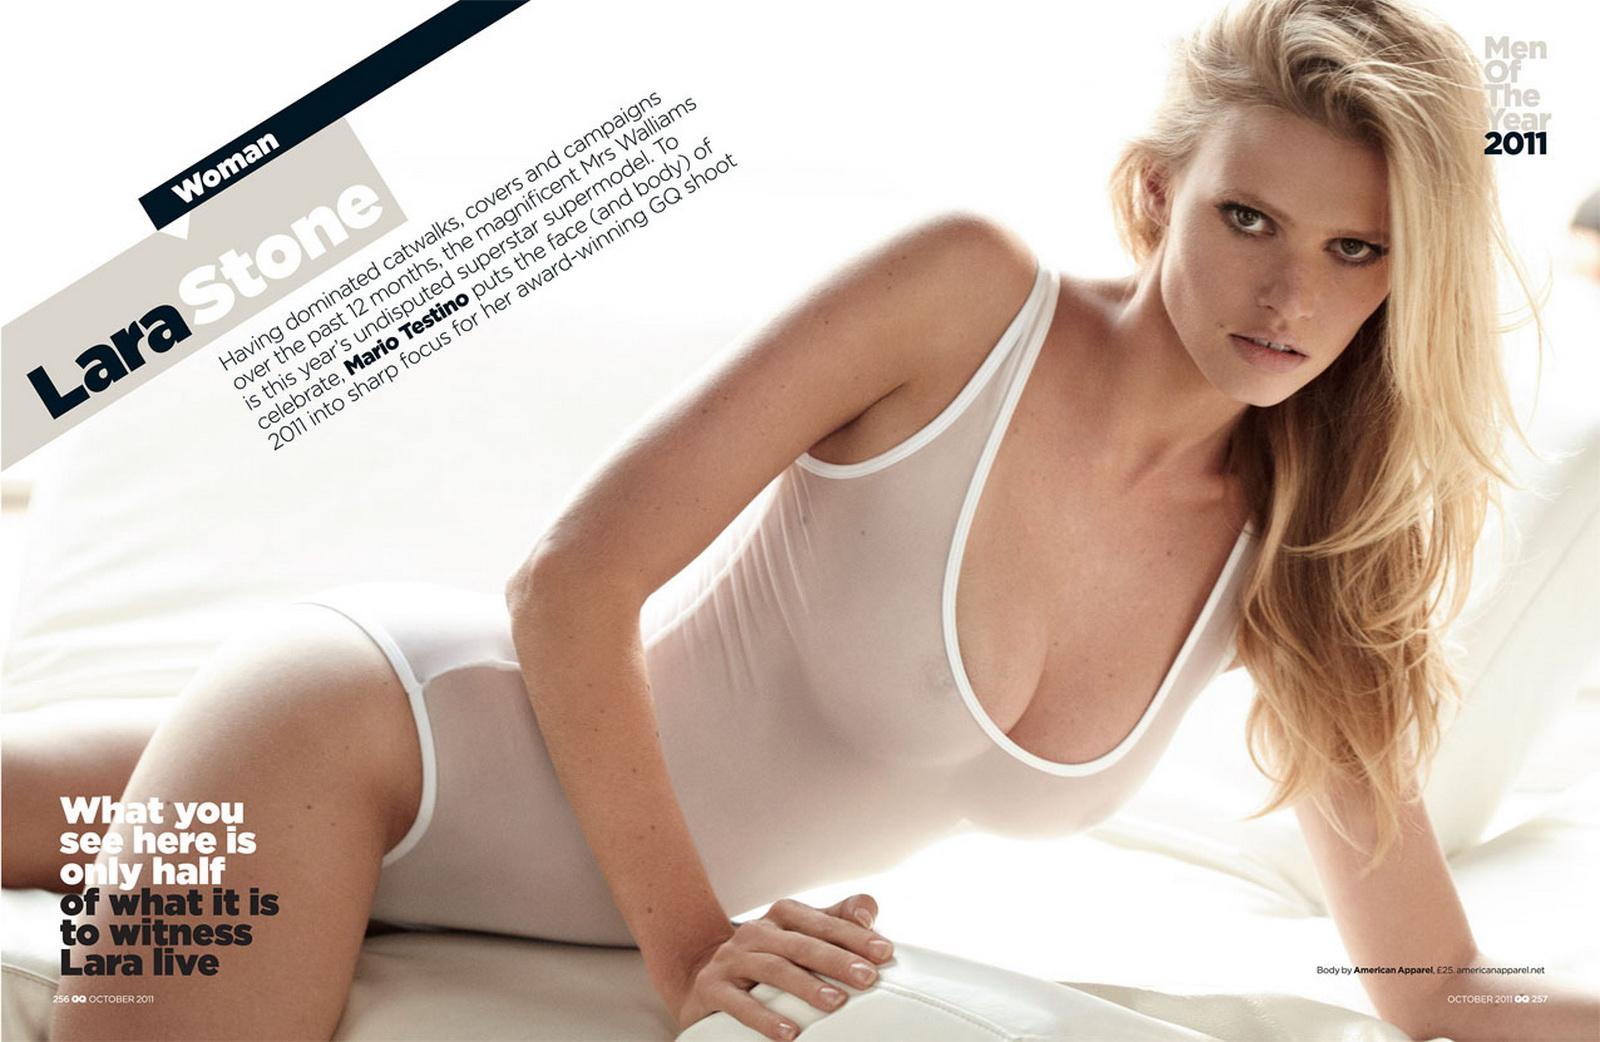 http://3.bp.blogspot.com/-EOvKSUuxsKk/Tn8FFkQ4MWI/AAAAAAAACI0/uxgQc0p9M8k/s1600/Lara+Stone+nude+see+through++in+GQ+Magazine+1.jpg